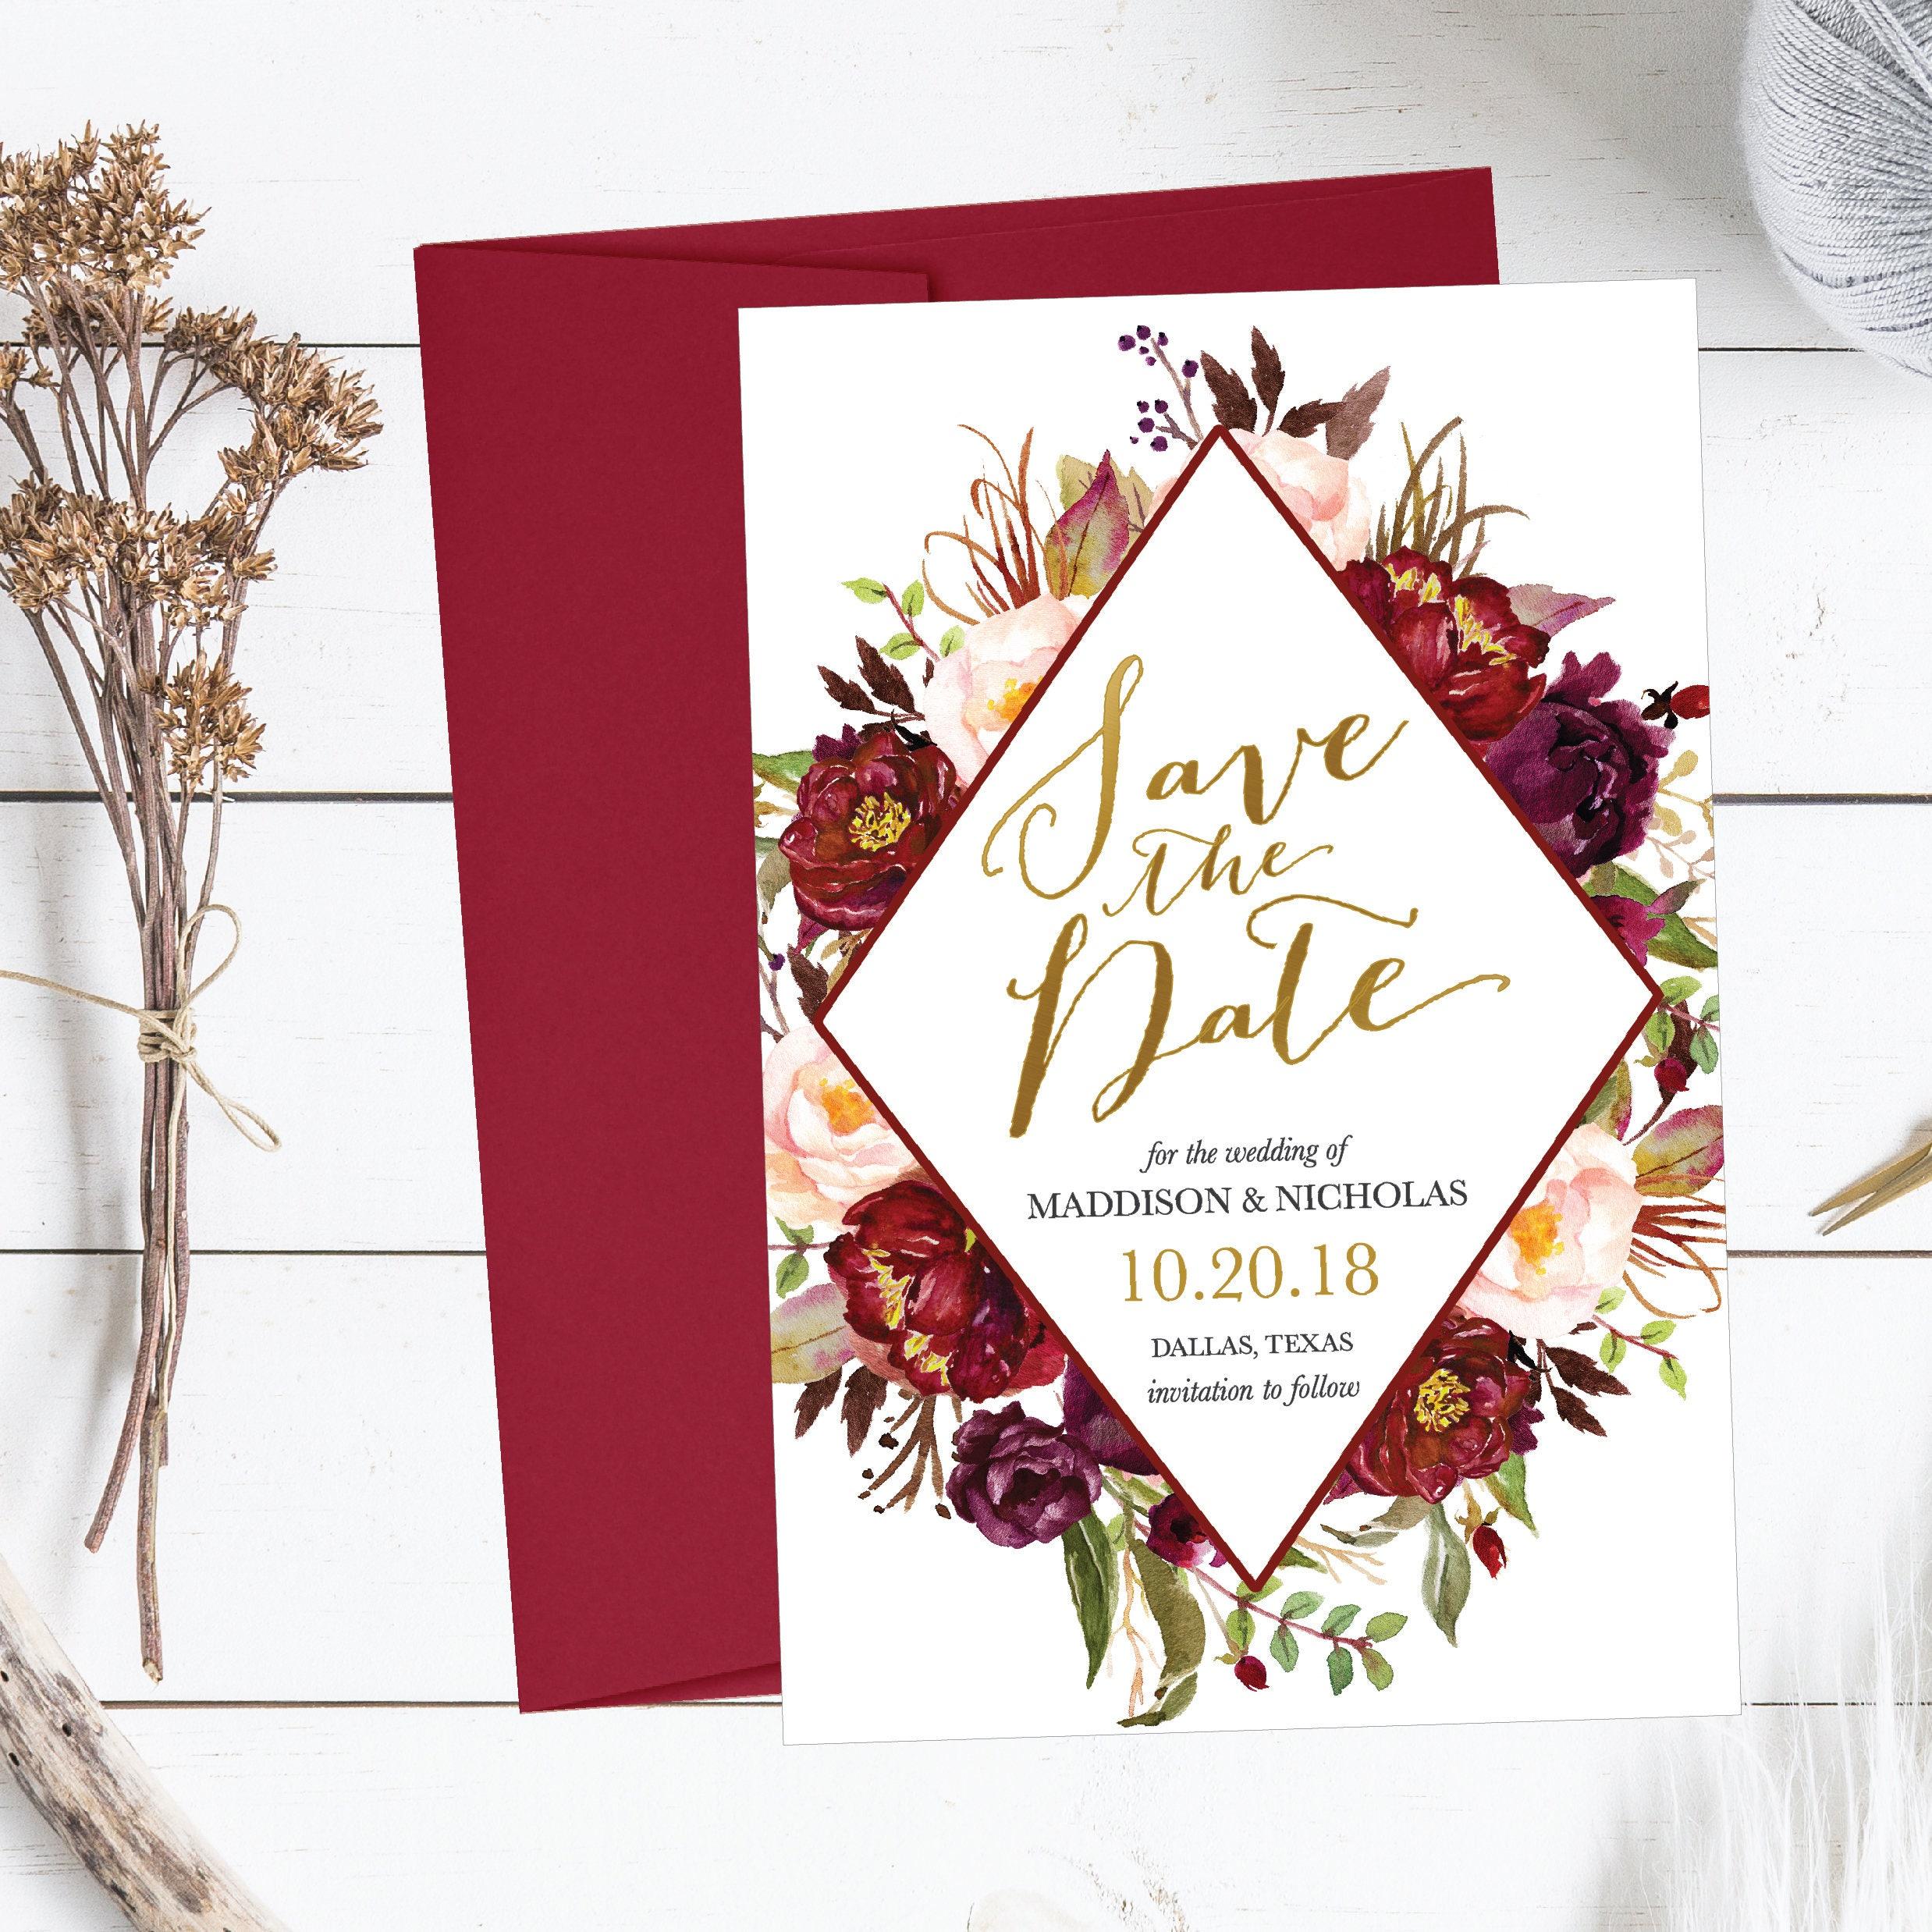 Printable Wedding Save The Date Cards Editable Template, Destination ...